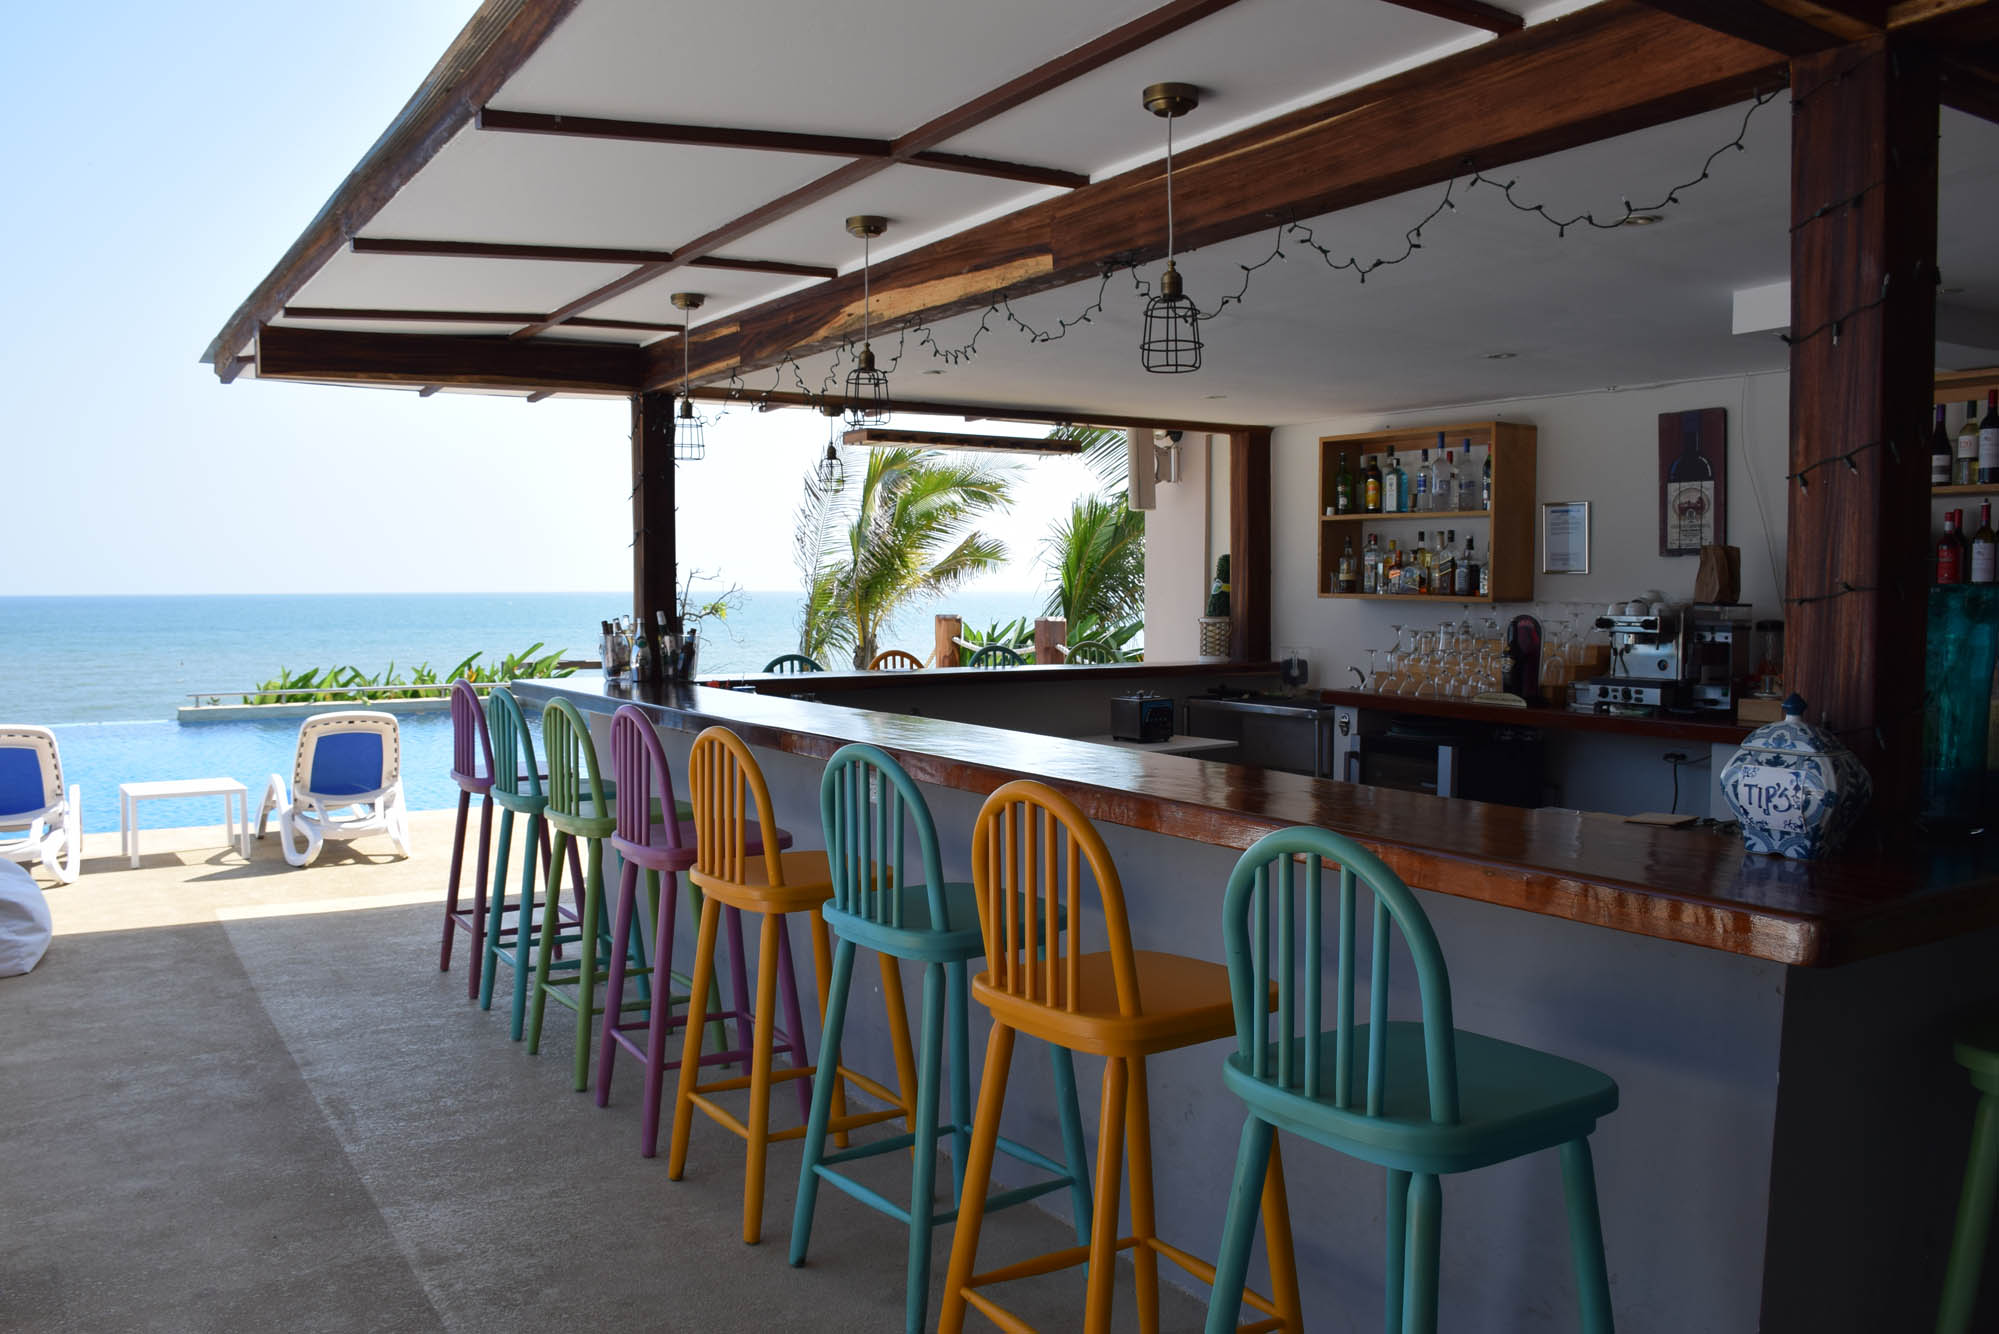 Pedasi-Isla-Iguana-Panama-Andromeda-Playa-Venao-LalaRebelo_0119